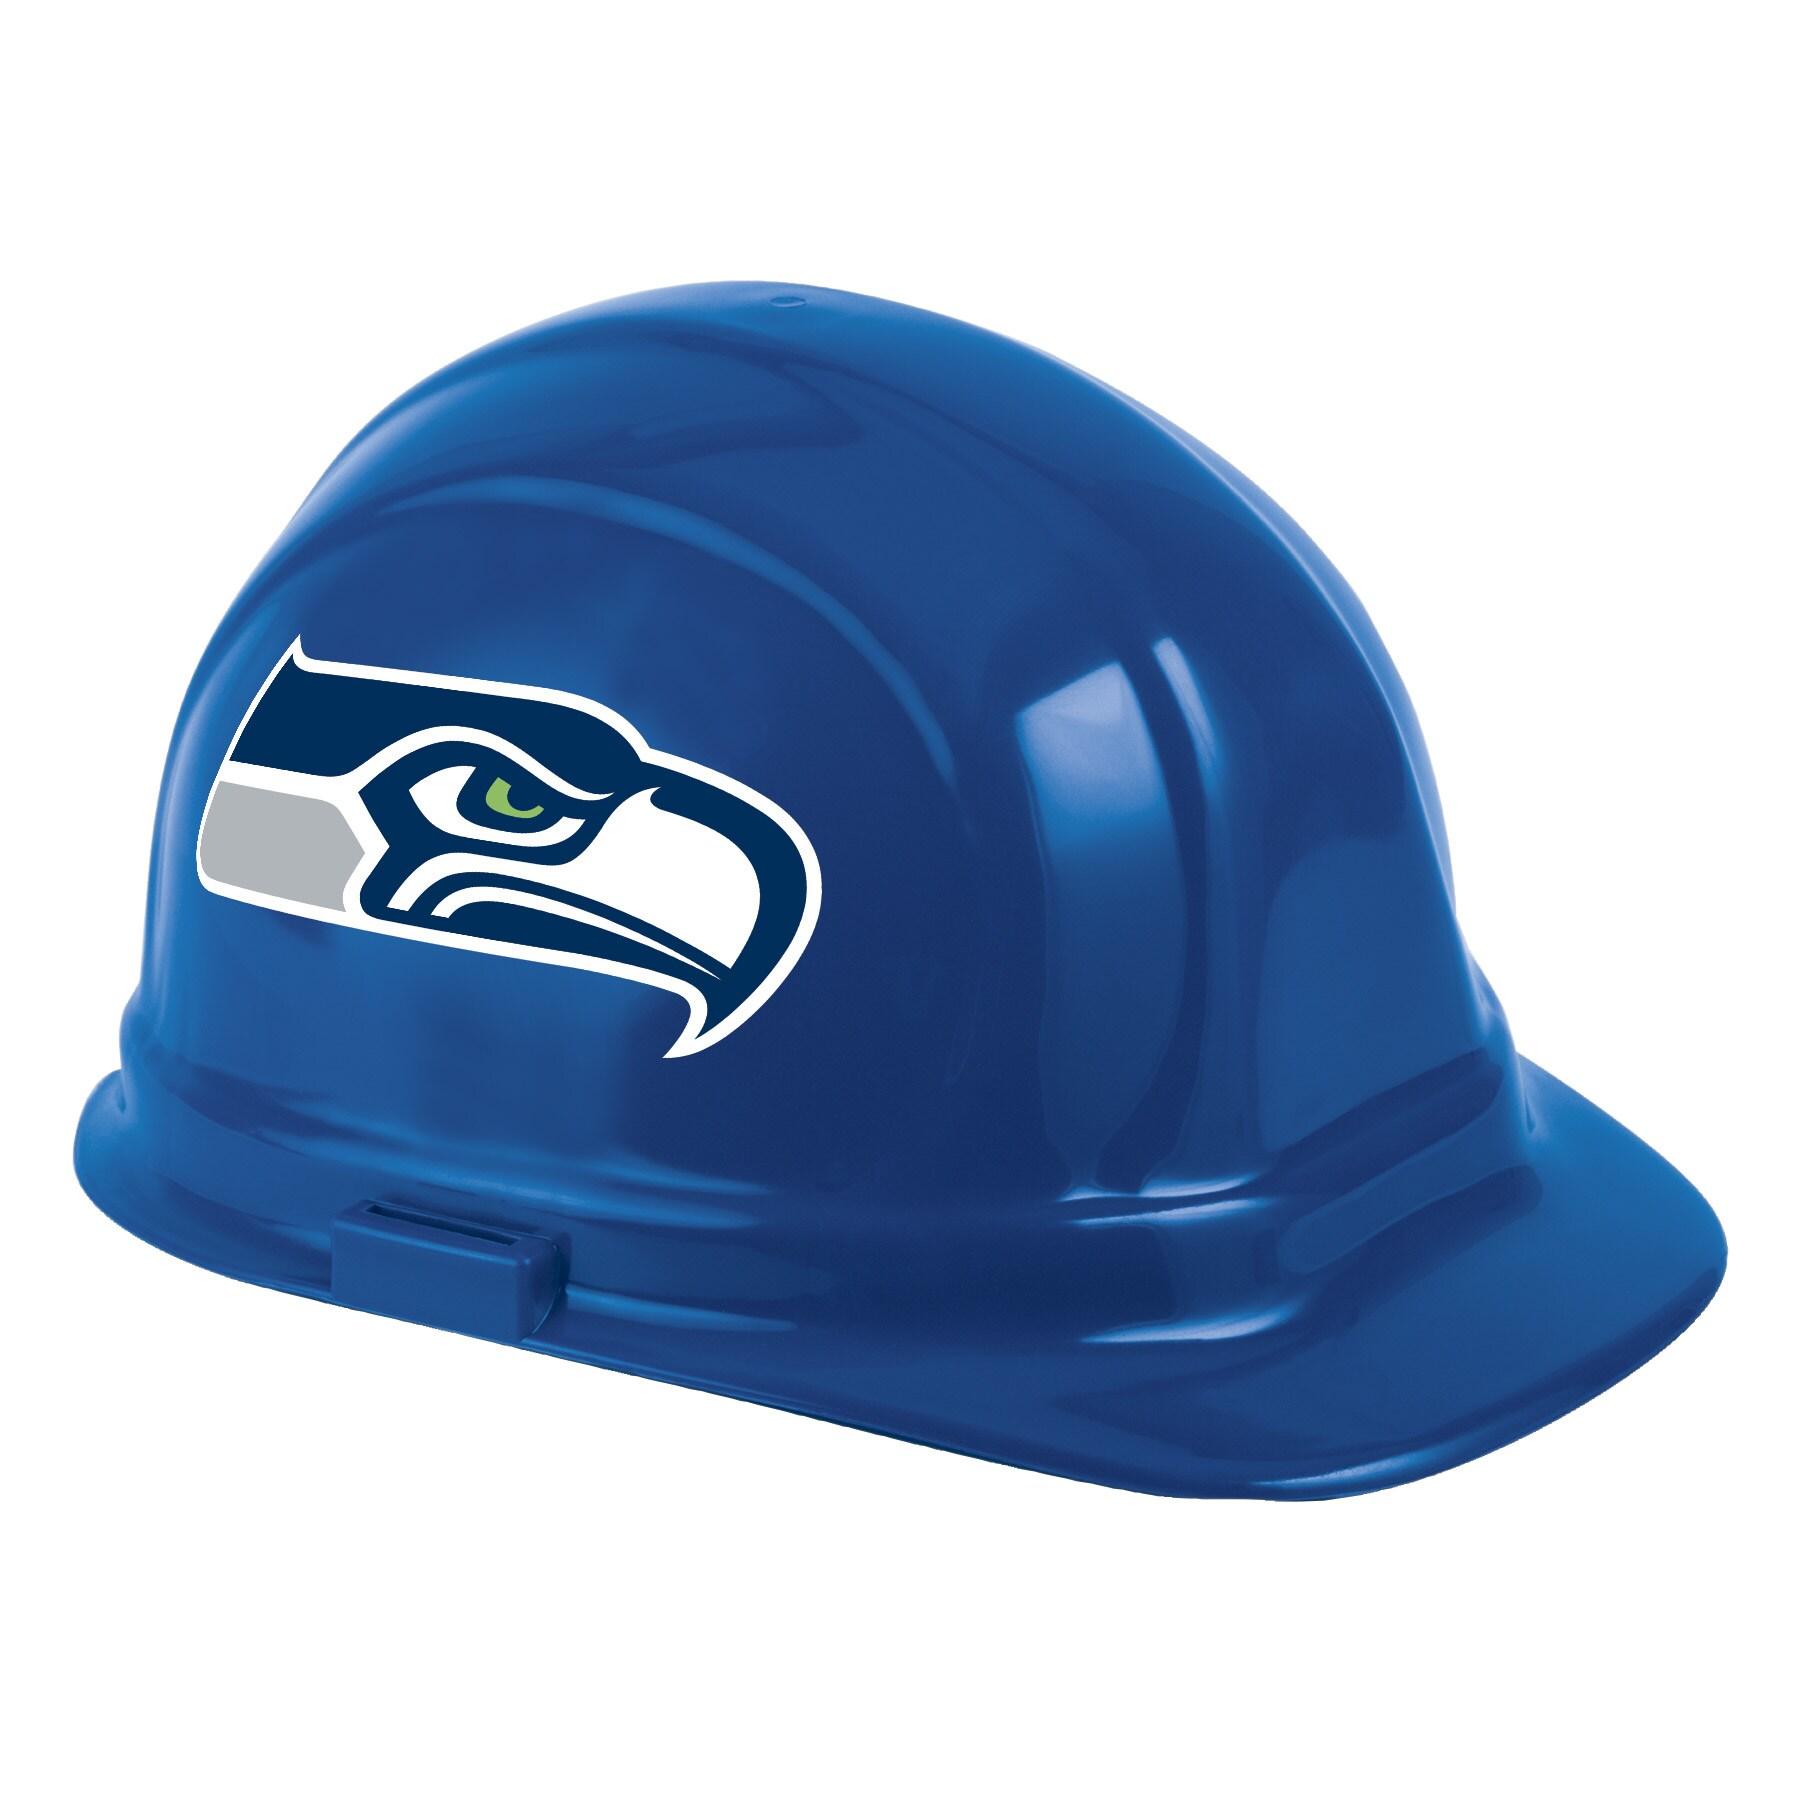 Seattle Seahawks WinCraft Team Construction Hard Hat